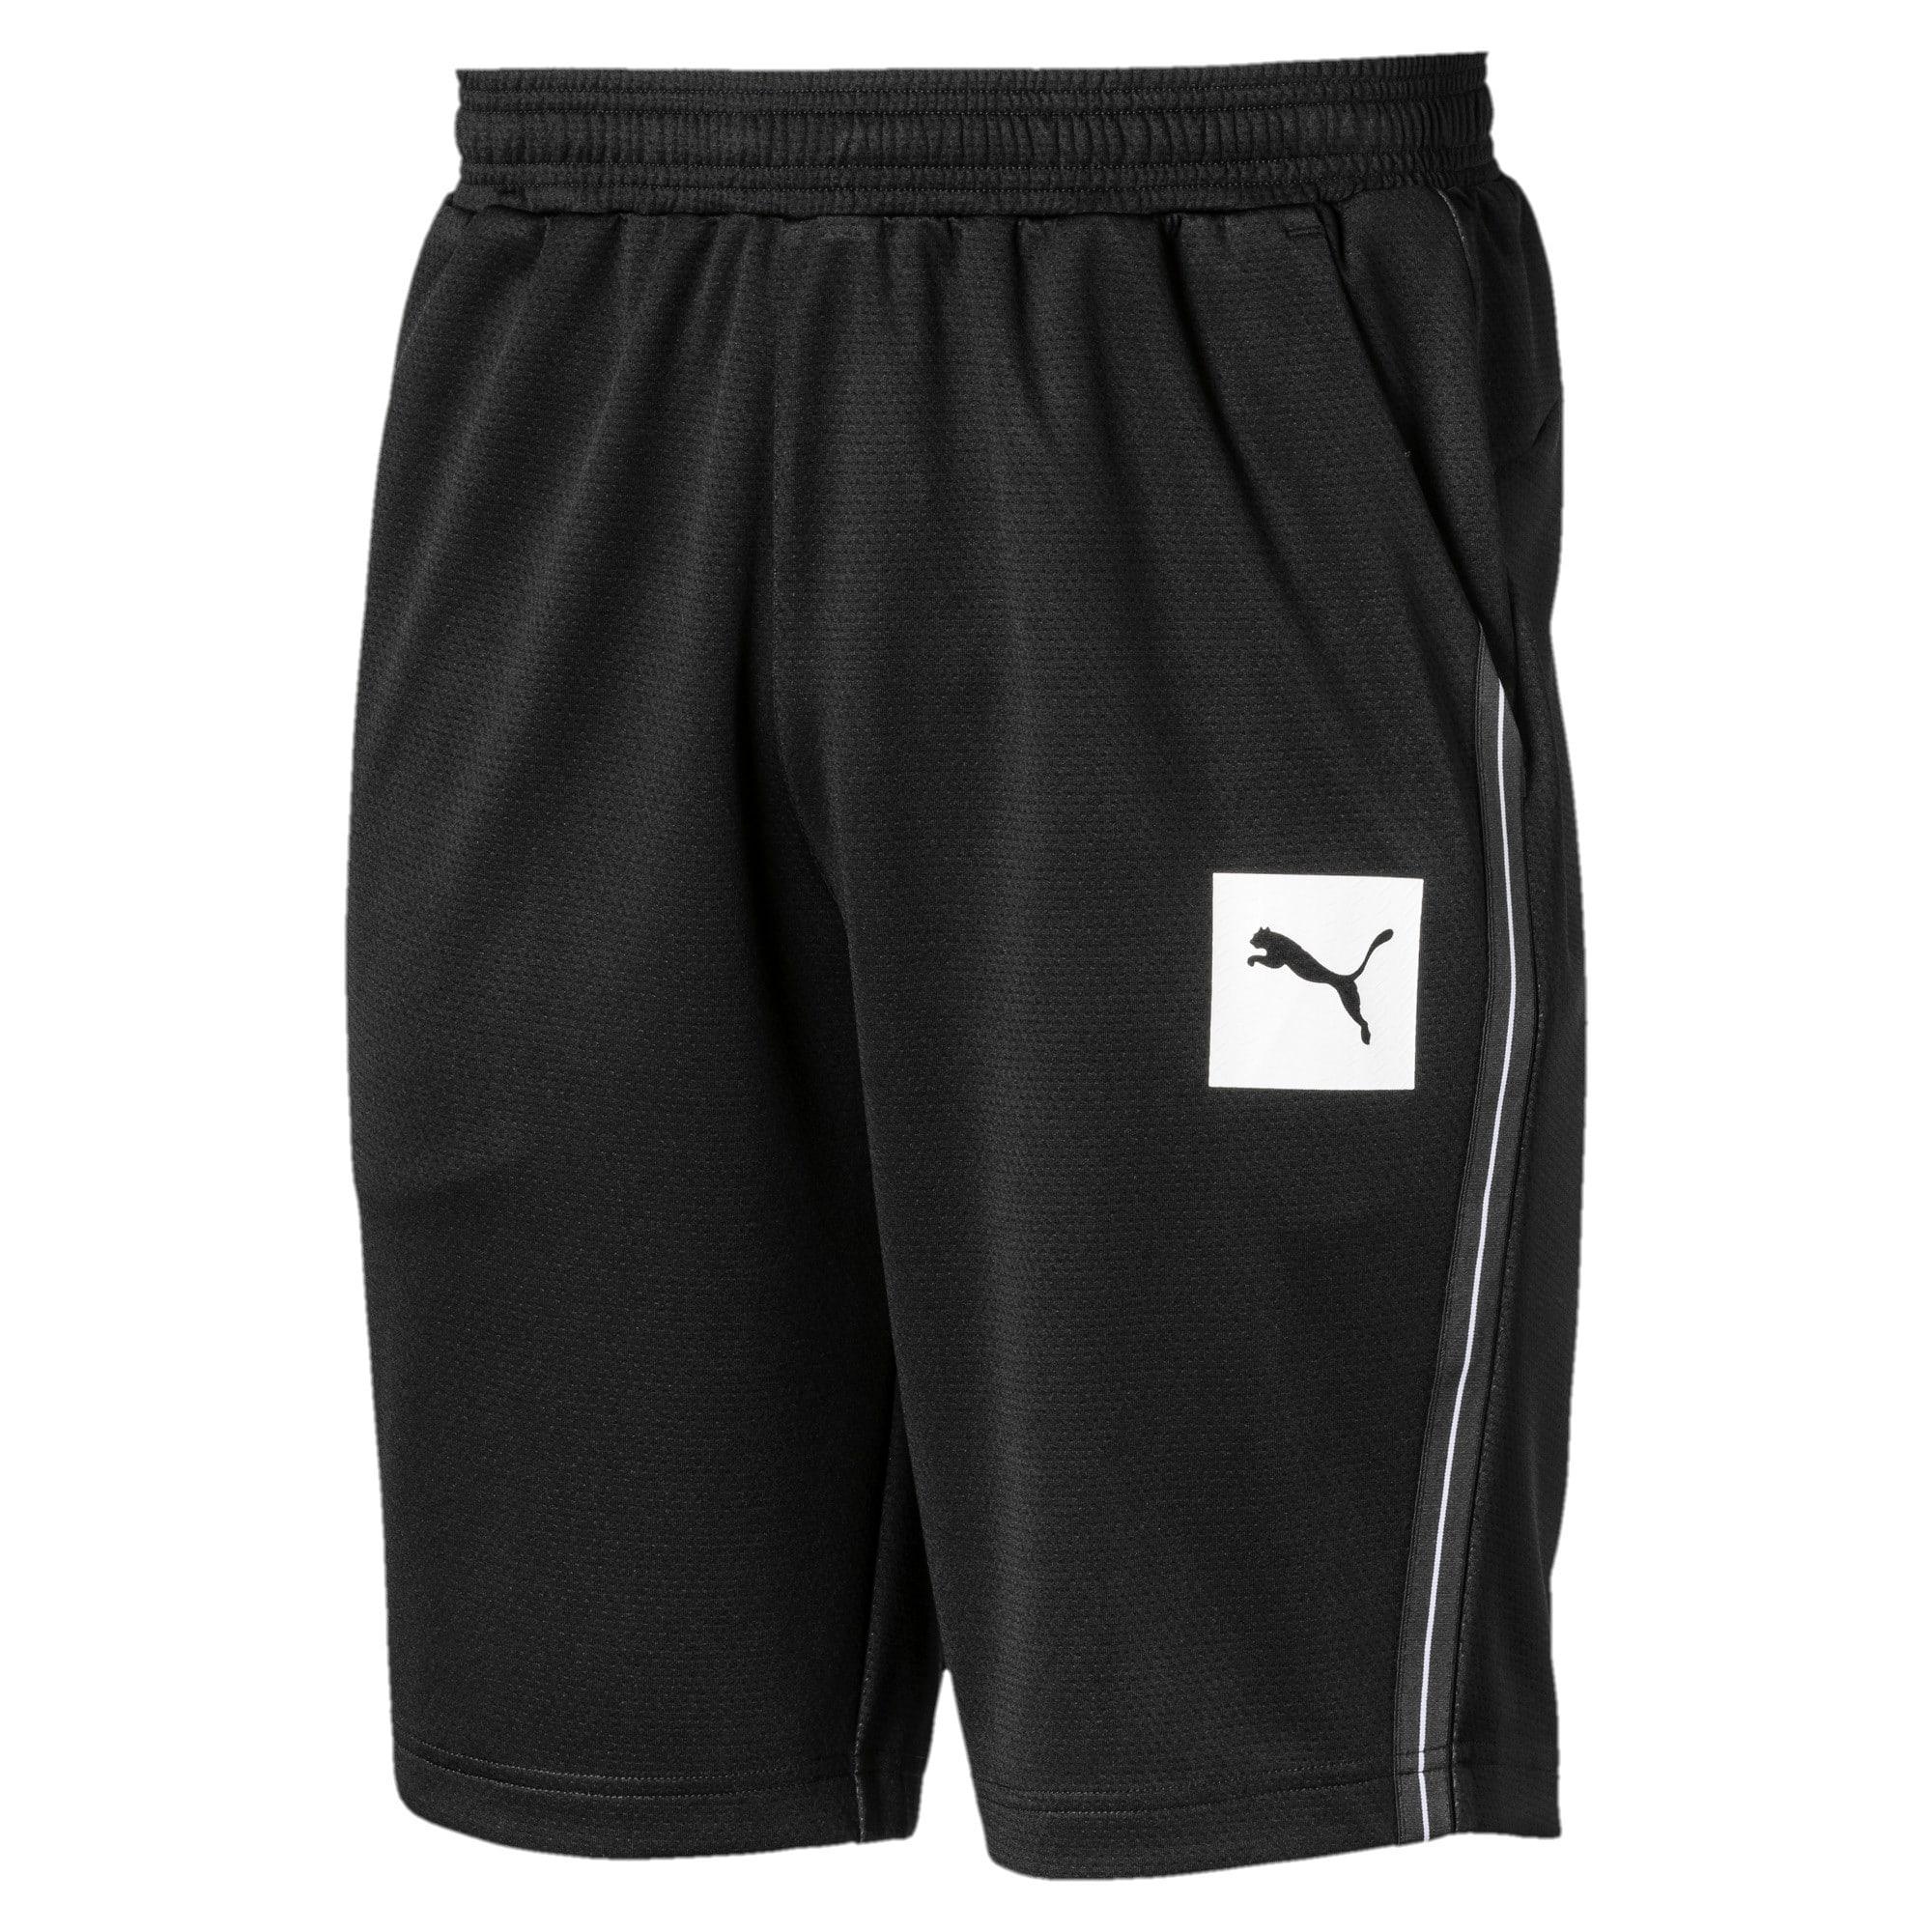 Thumbnail 4 of Tec Sports Interlock Men's Shorts, Puma Black, medium-IND